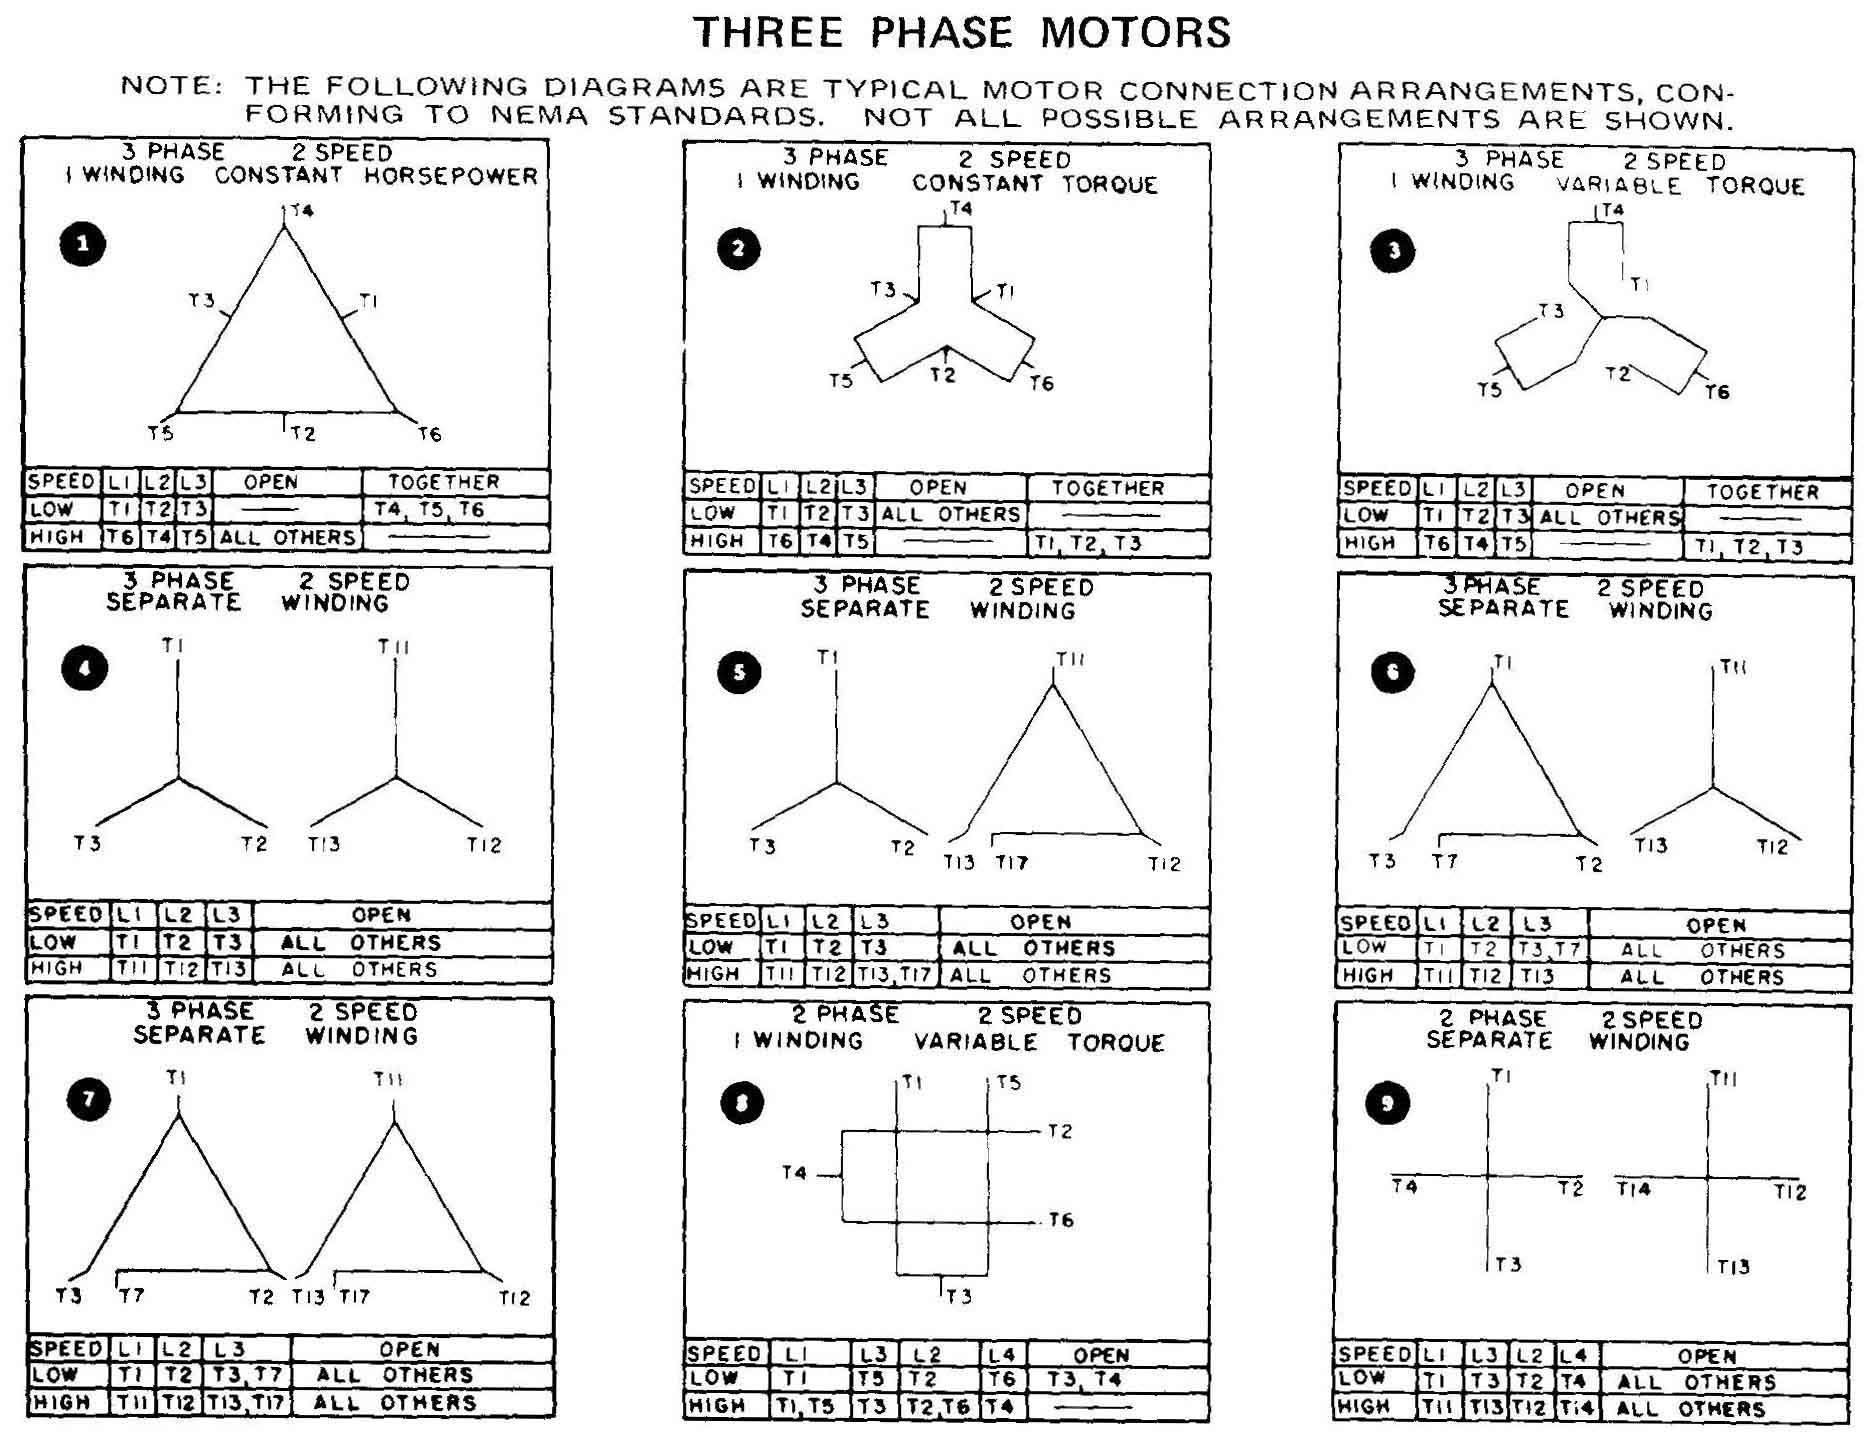 12 Lead 3 Phase Motor Wiring Diagram | Manual E-Books - 3 Phase Motor Wiring Diagram 12 Leads